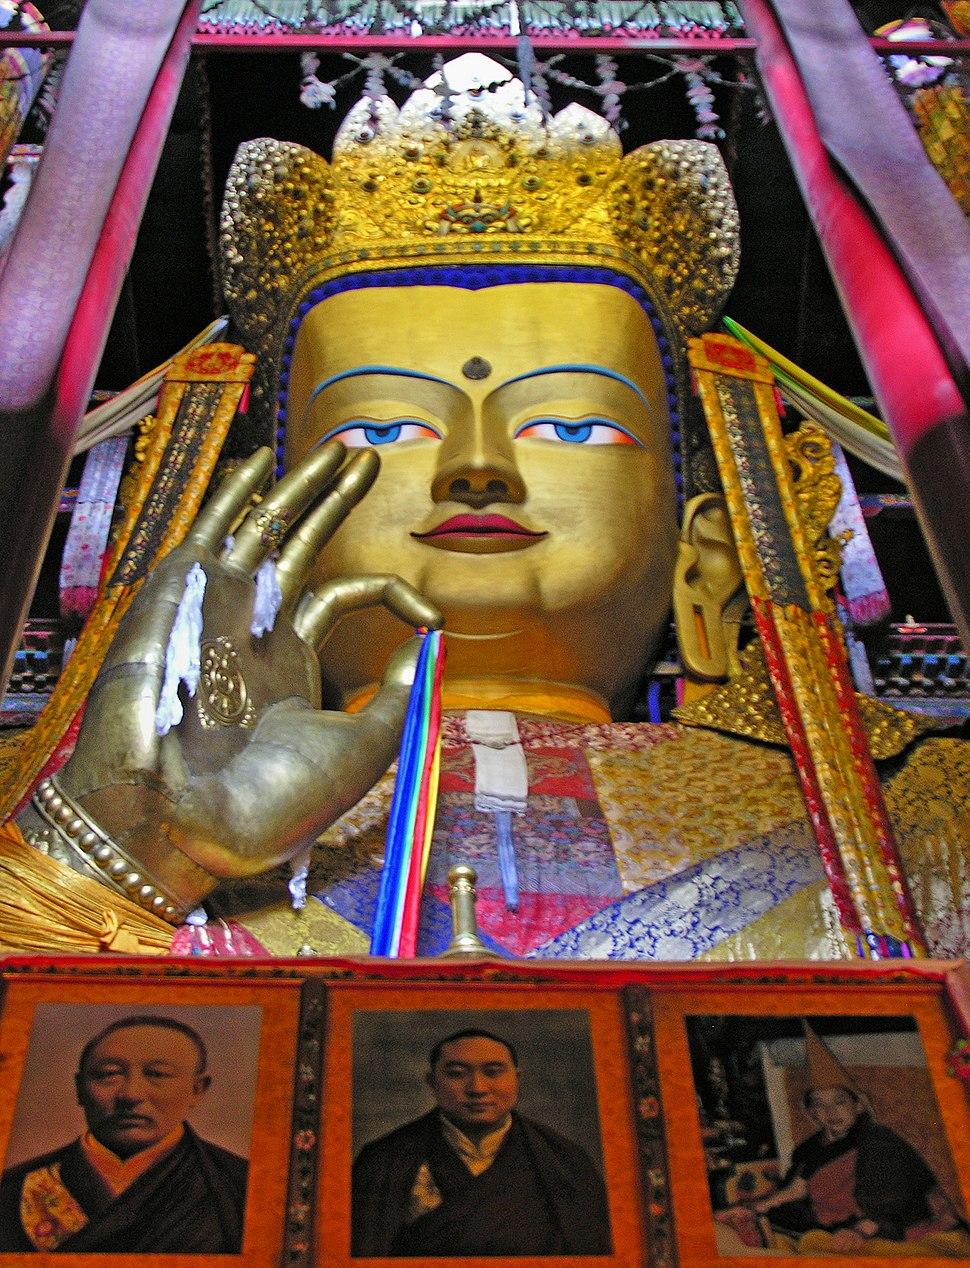 Tibet-6048 - Largest Sitting Maitreya Buddha